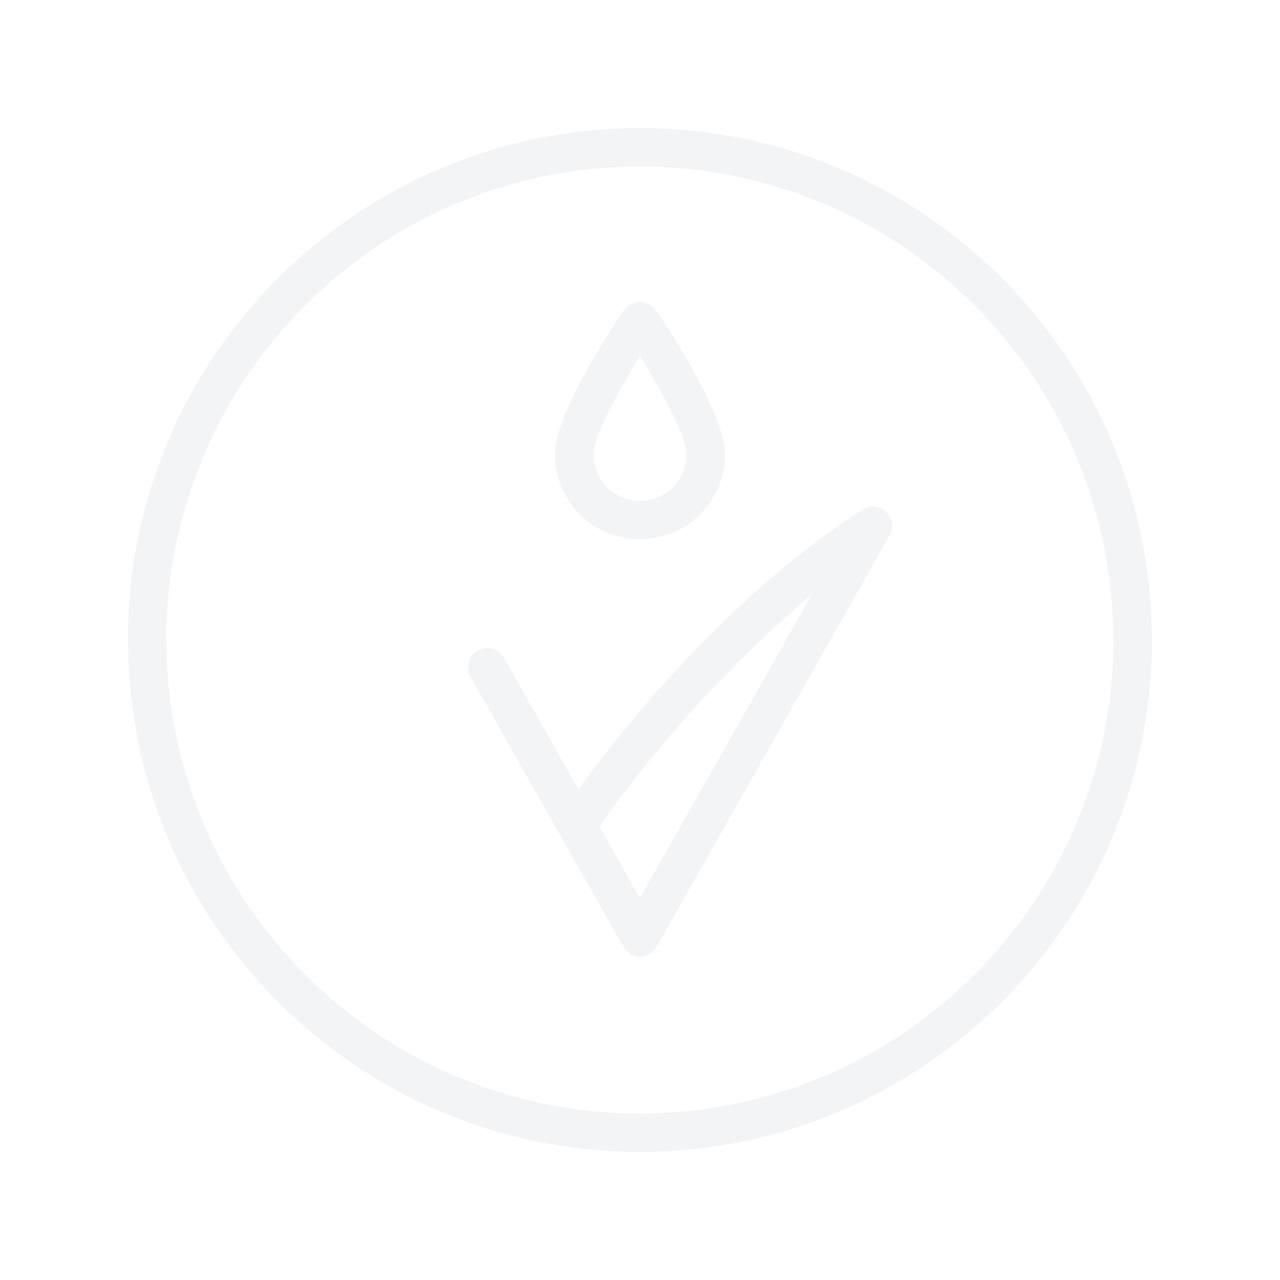 REN Evercalm Global Protection Day Cream 50ml